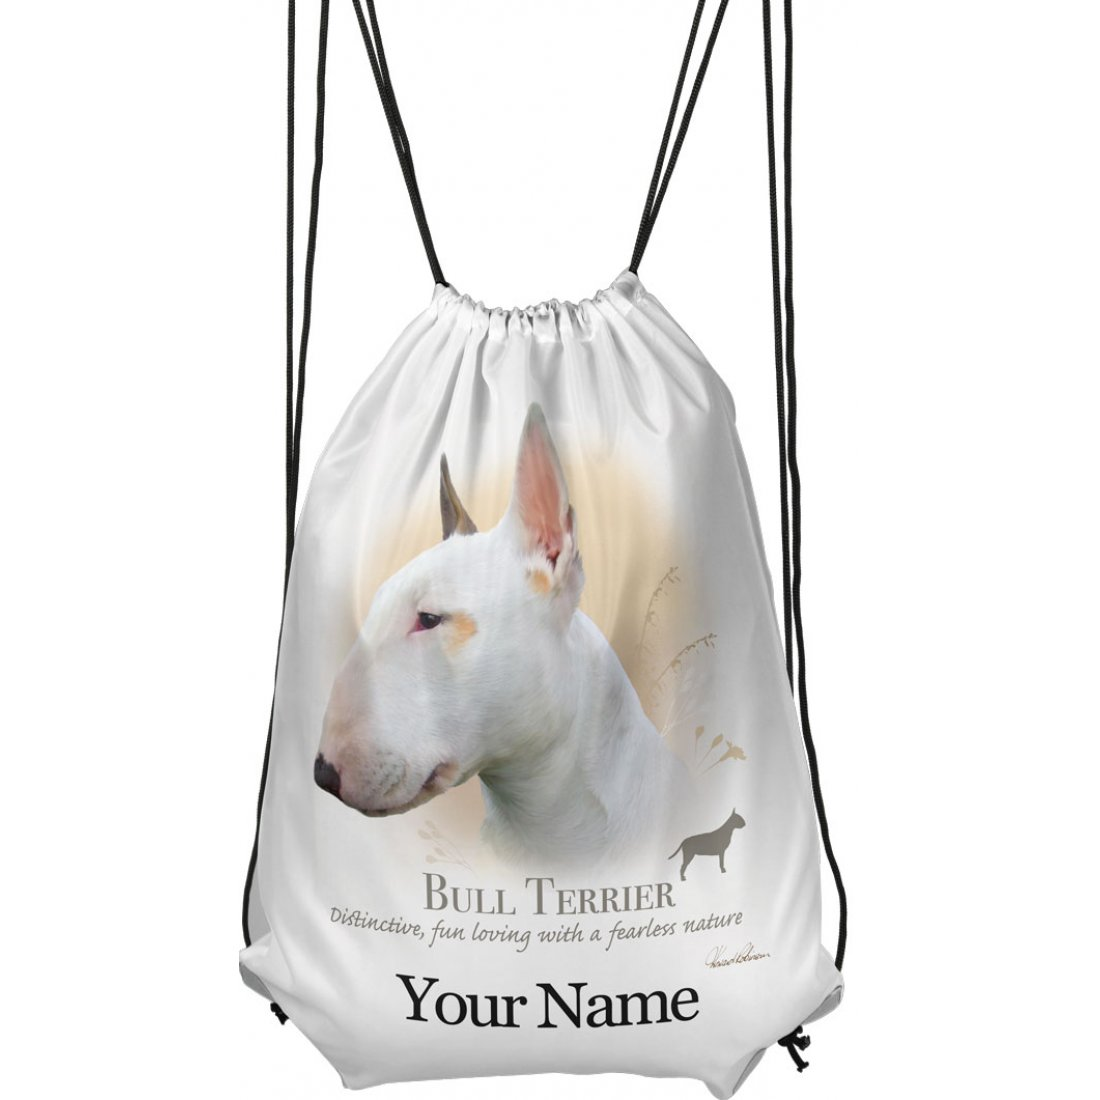 Personalised Bull Terrier Drawstring Gym Bag